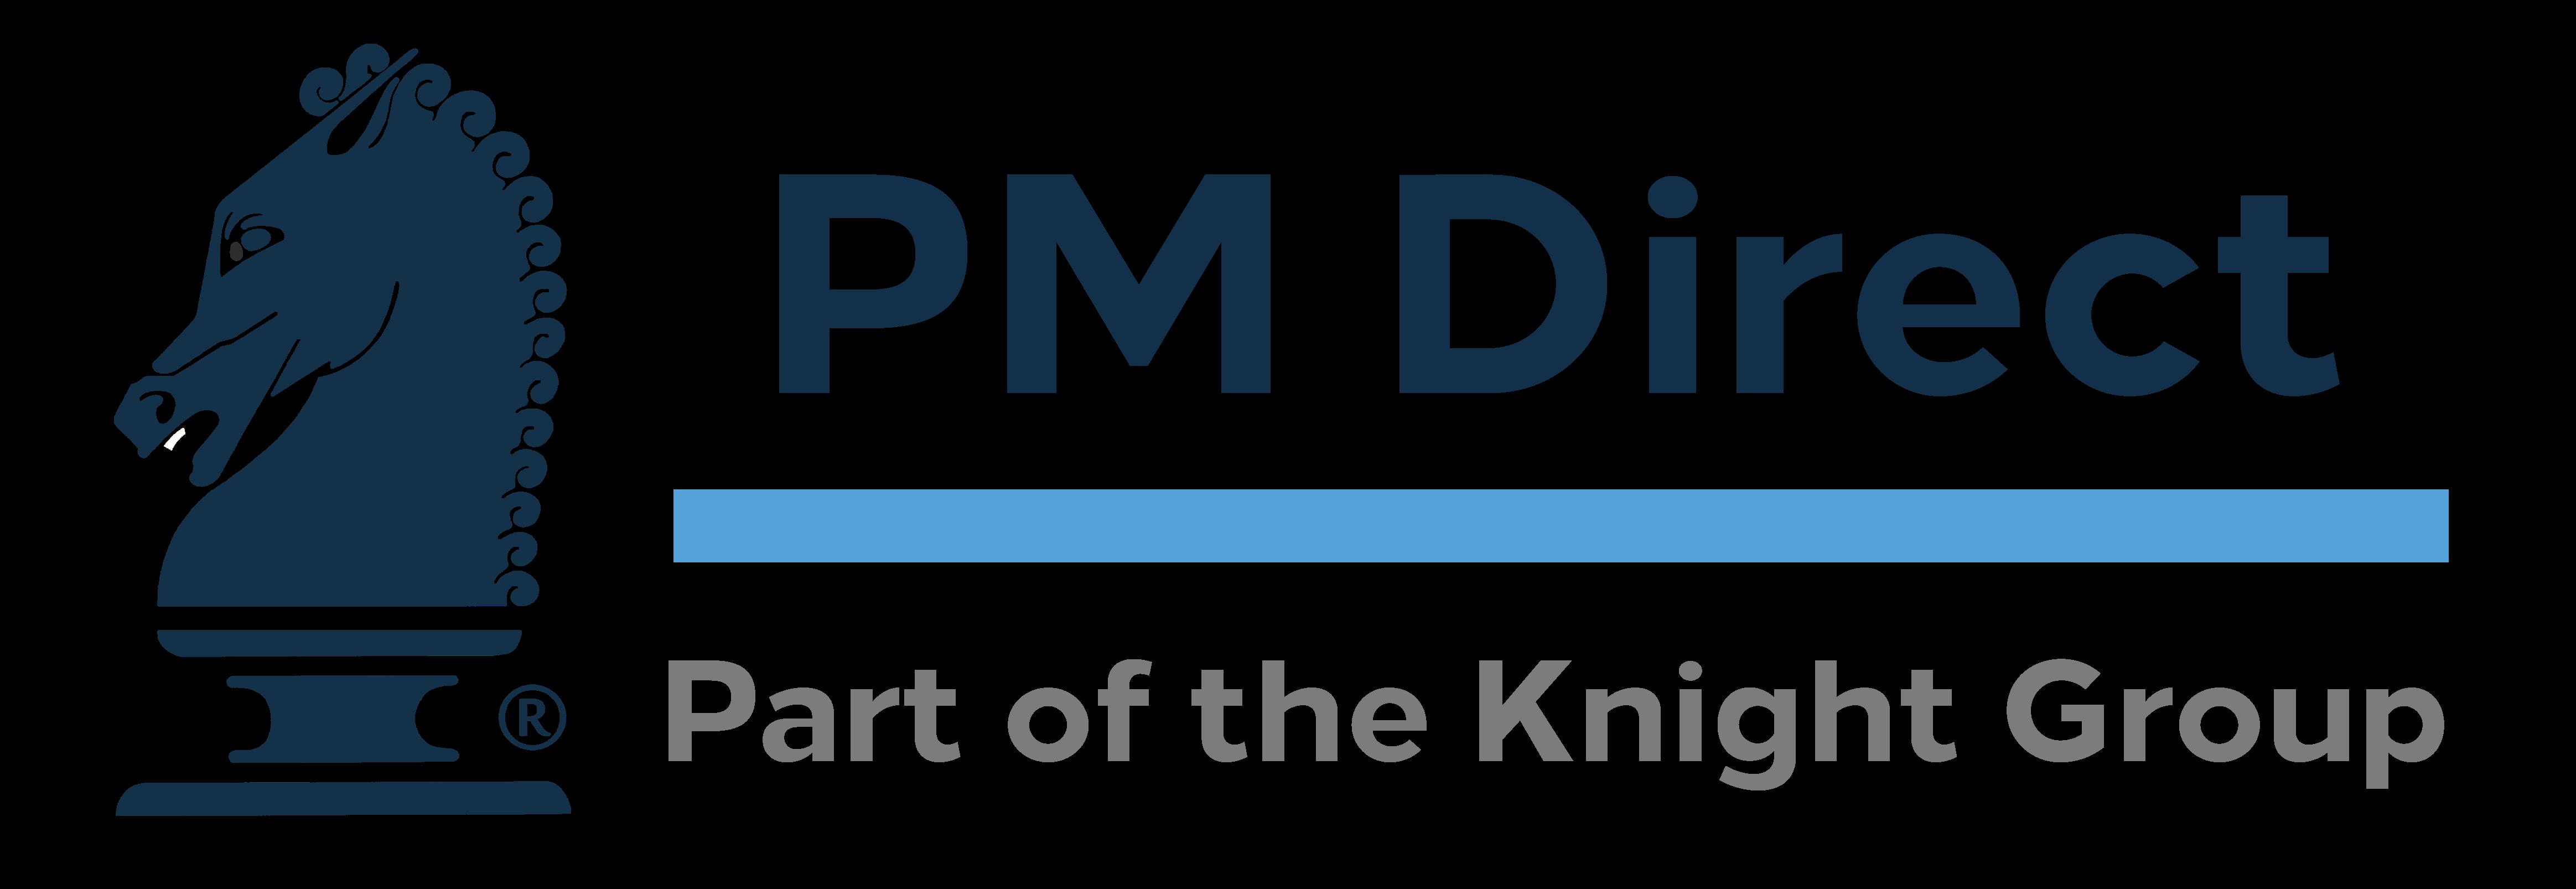 PM Direct